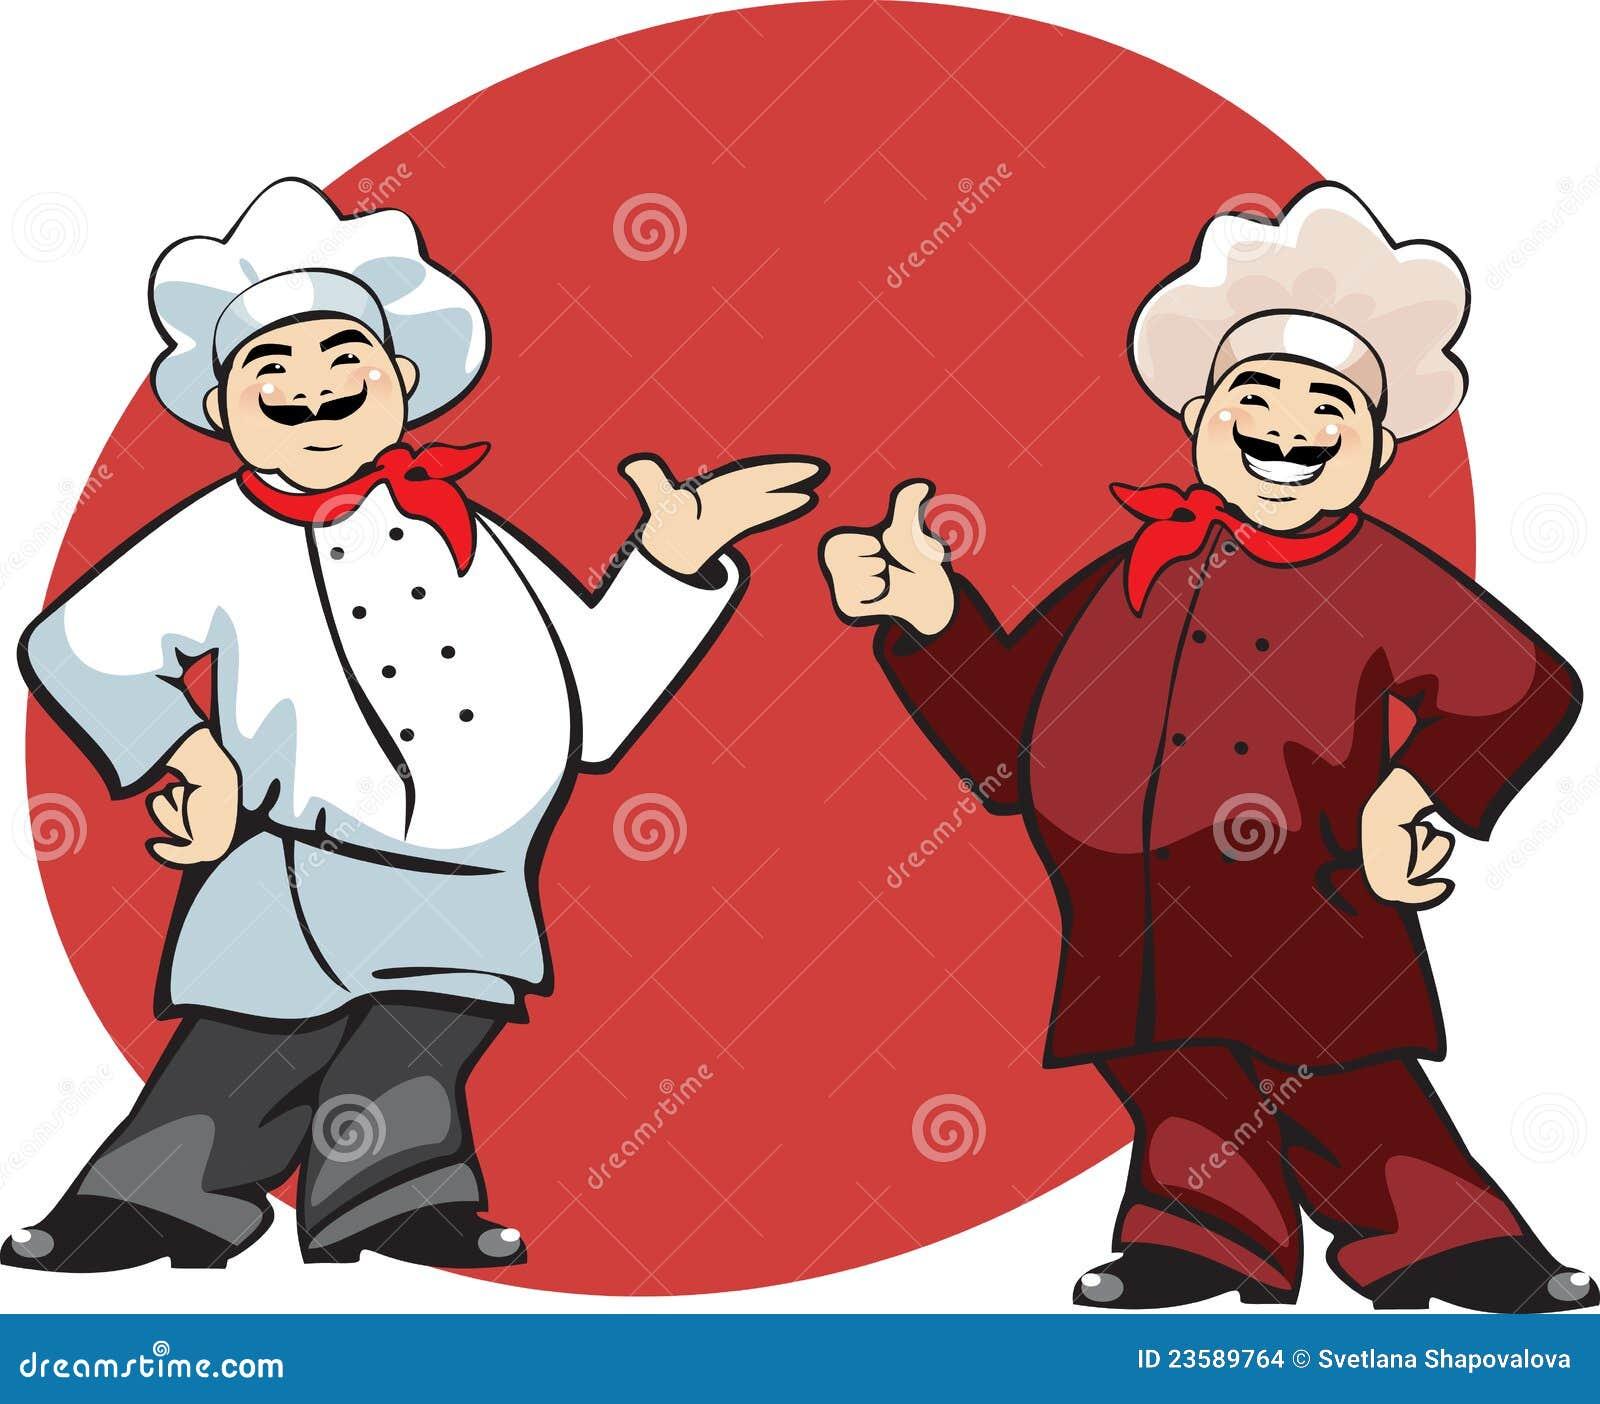 dessin anim de cuisinier - Dessin Cuisinier